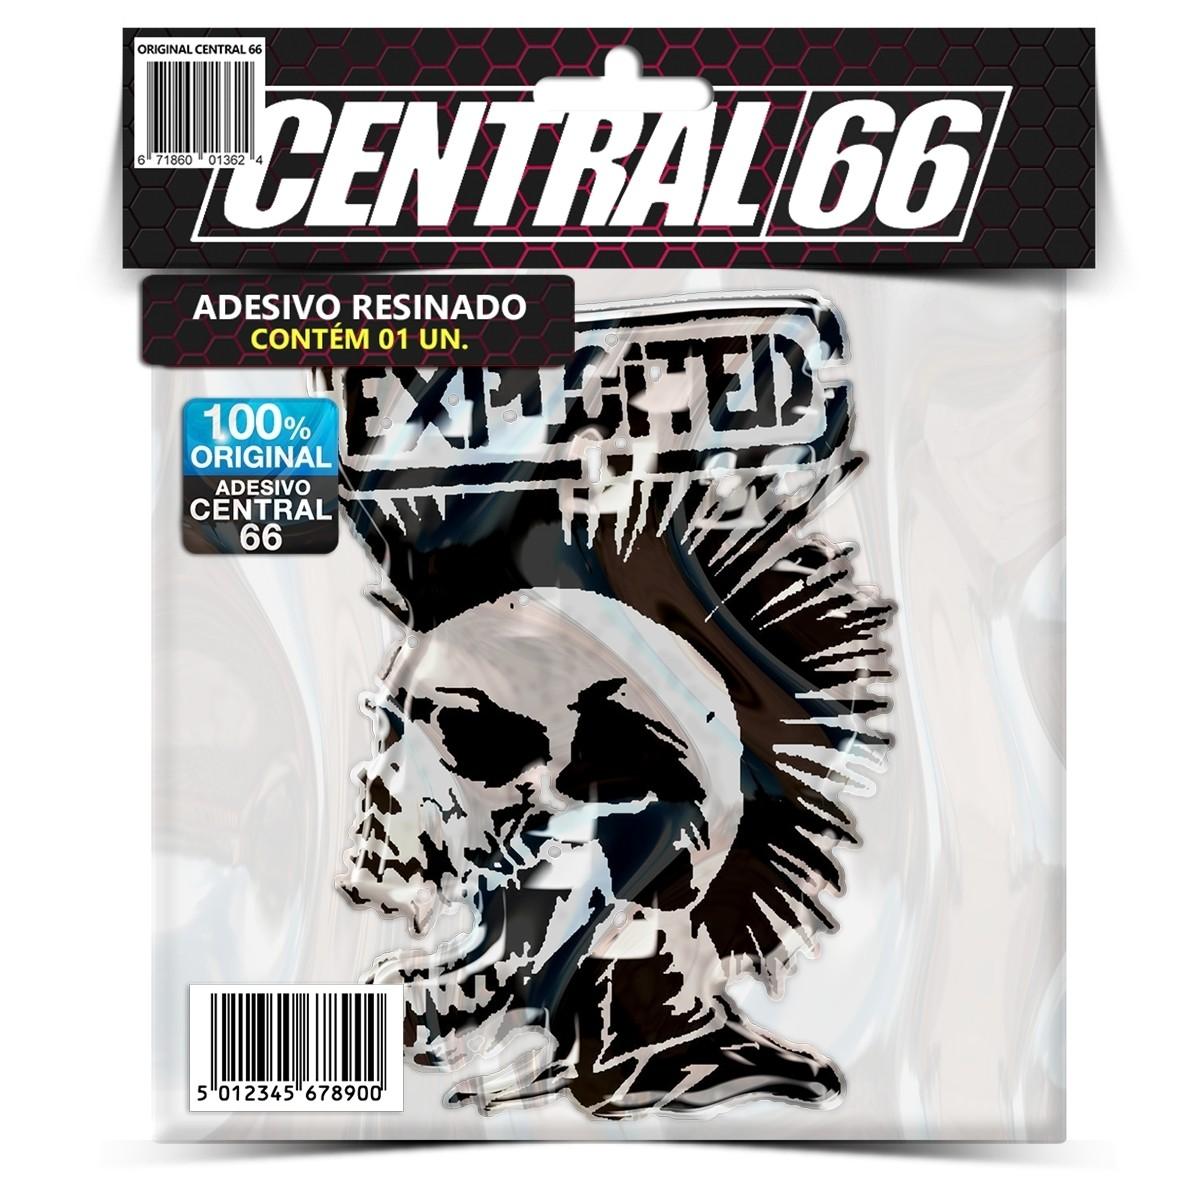 Adesivo The Exploited – Central 66